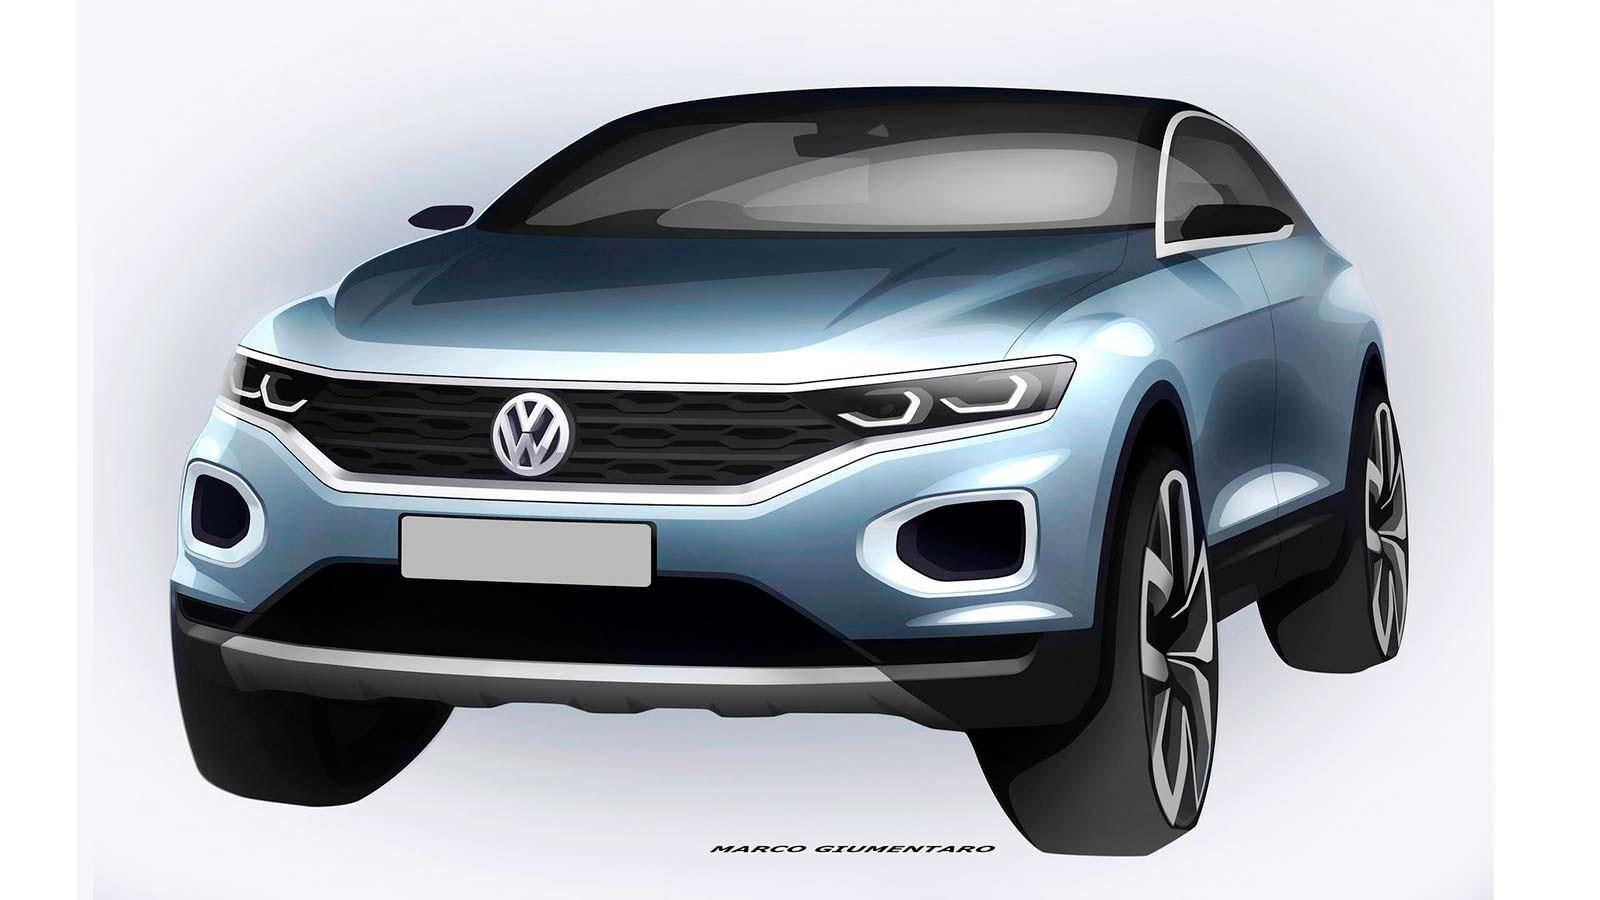 Официальный скетч Volkswagen T-Roc 2018